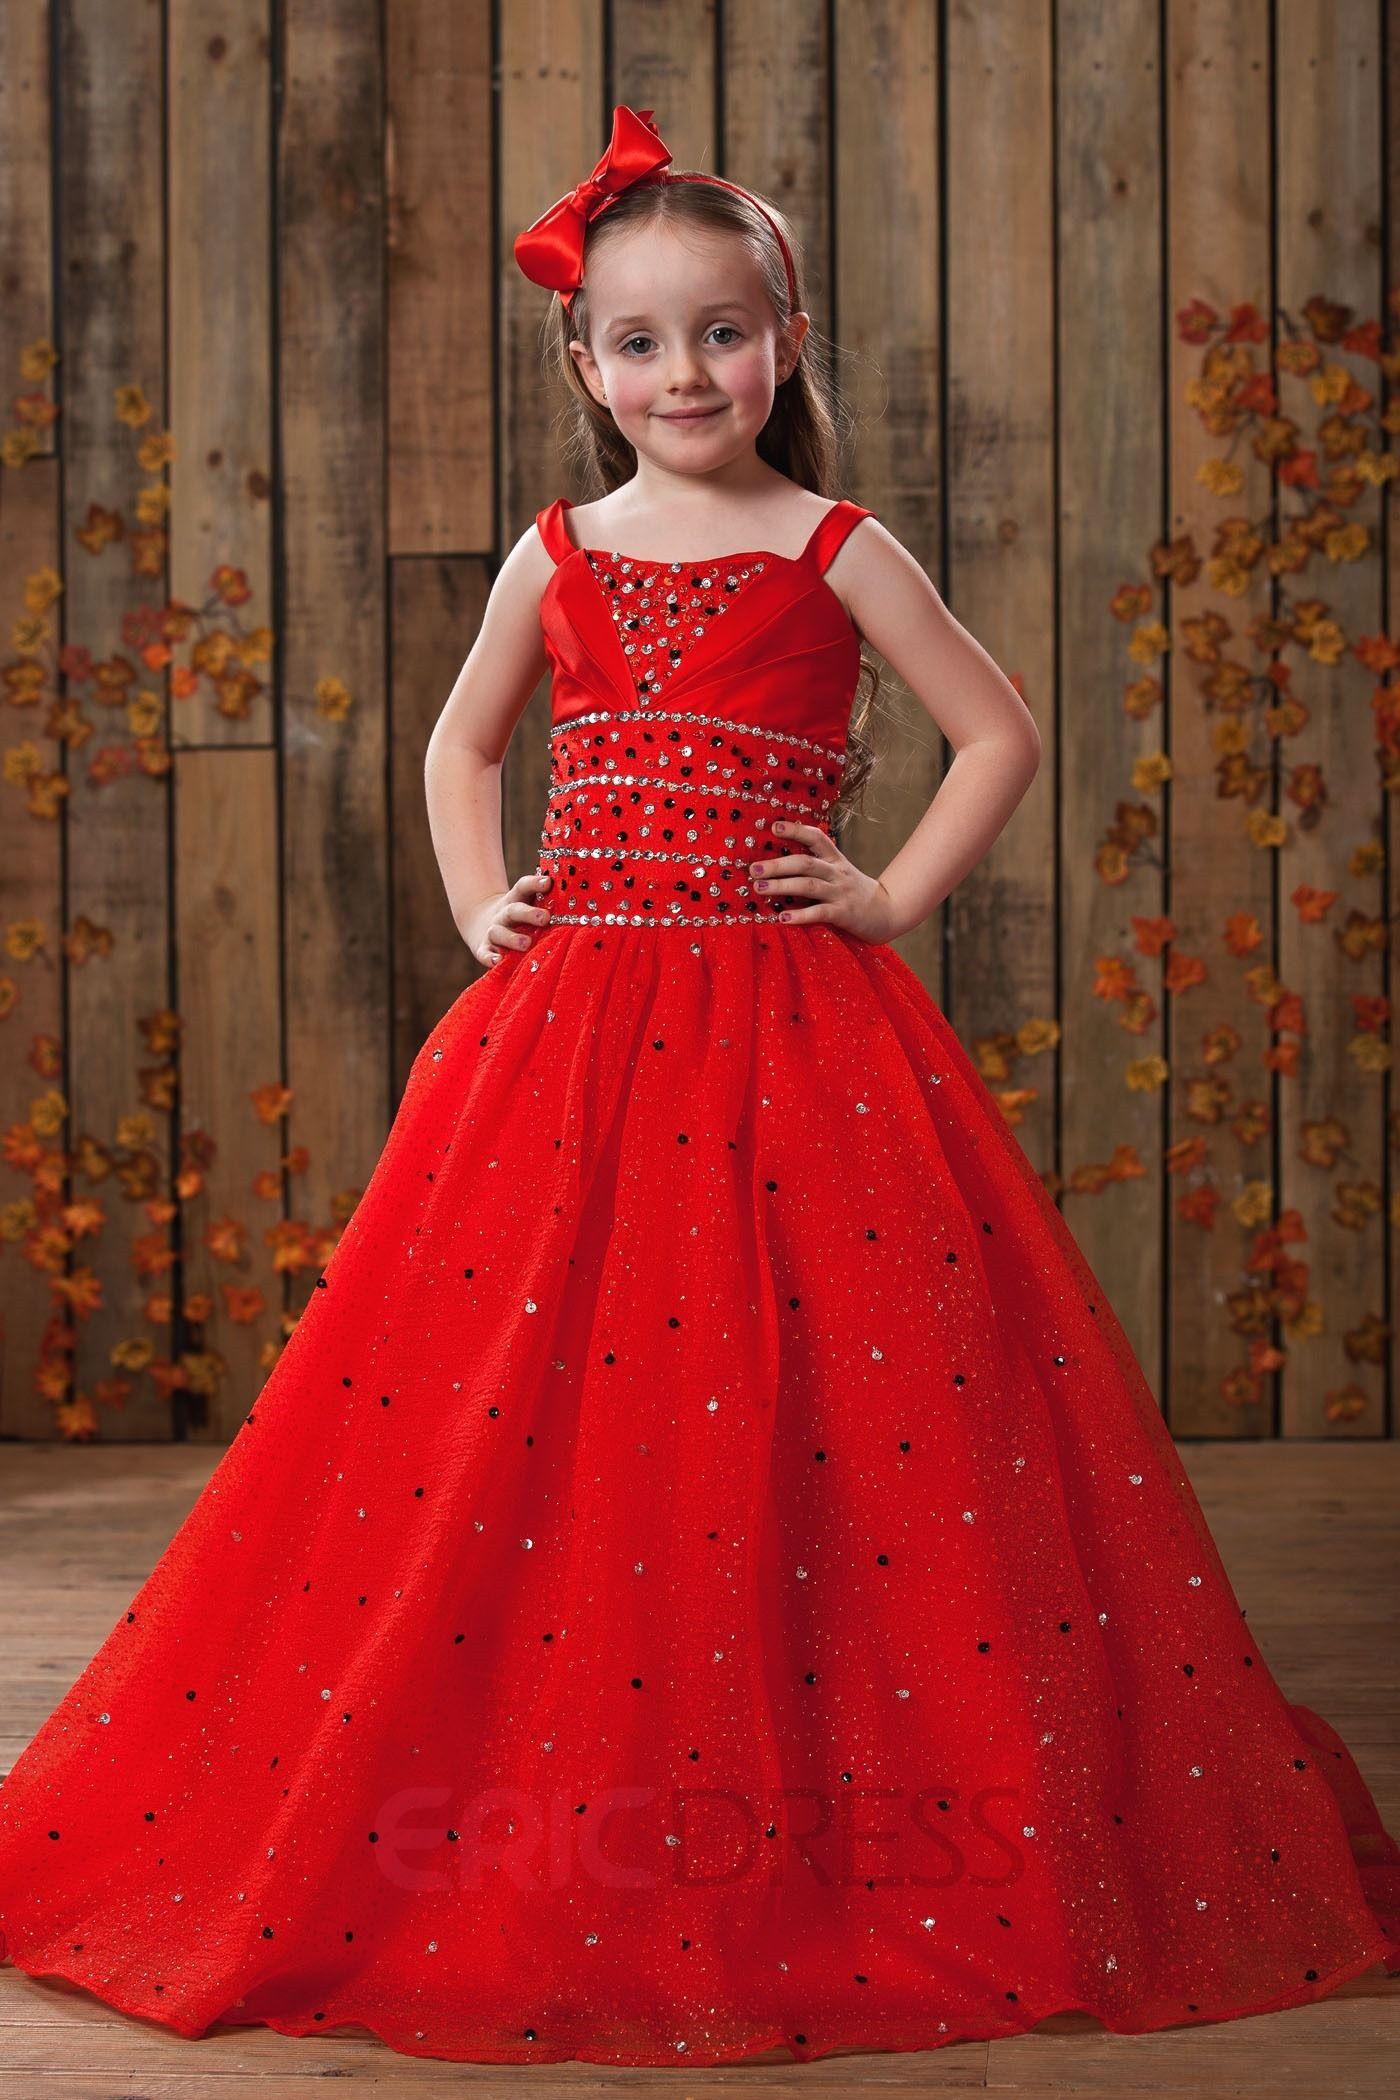 c54e1e336 ericdress.com offers high quality Amazing Ball Gown Floor-length Square  Neckline Sequins Flower Girl Dress Flower Girl Party Dresses unit price of  $ 104.49.